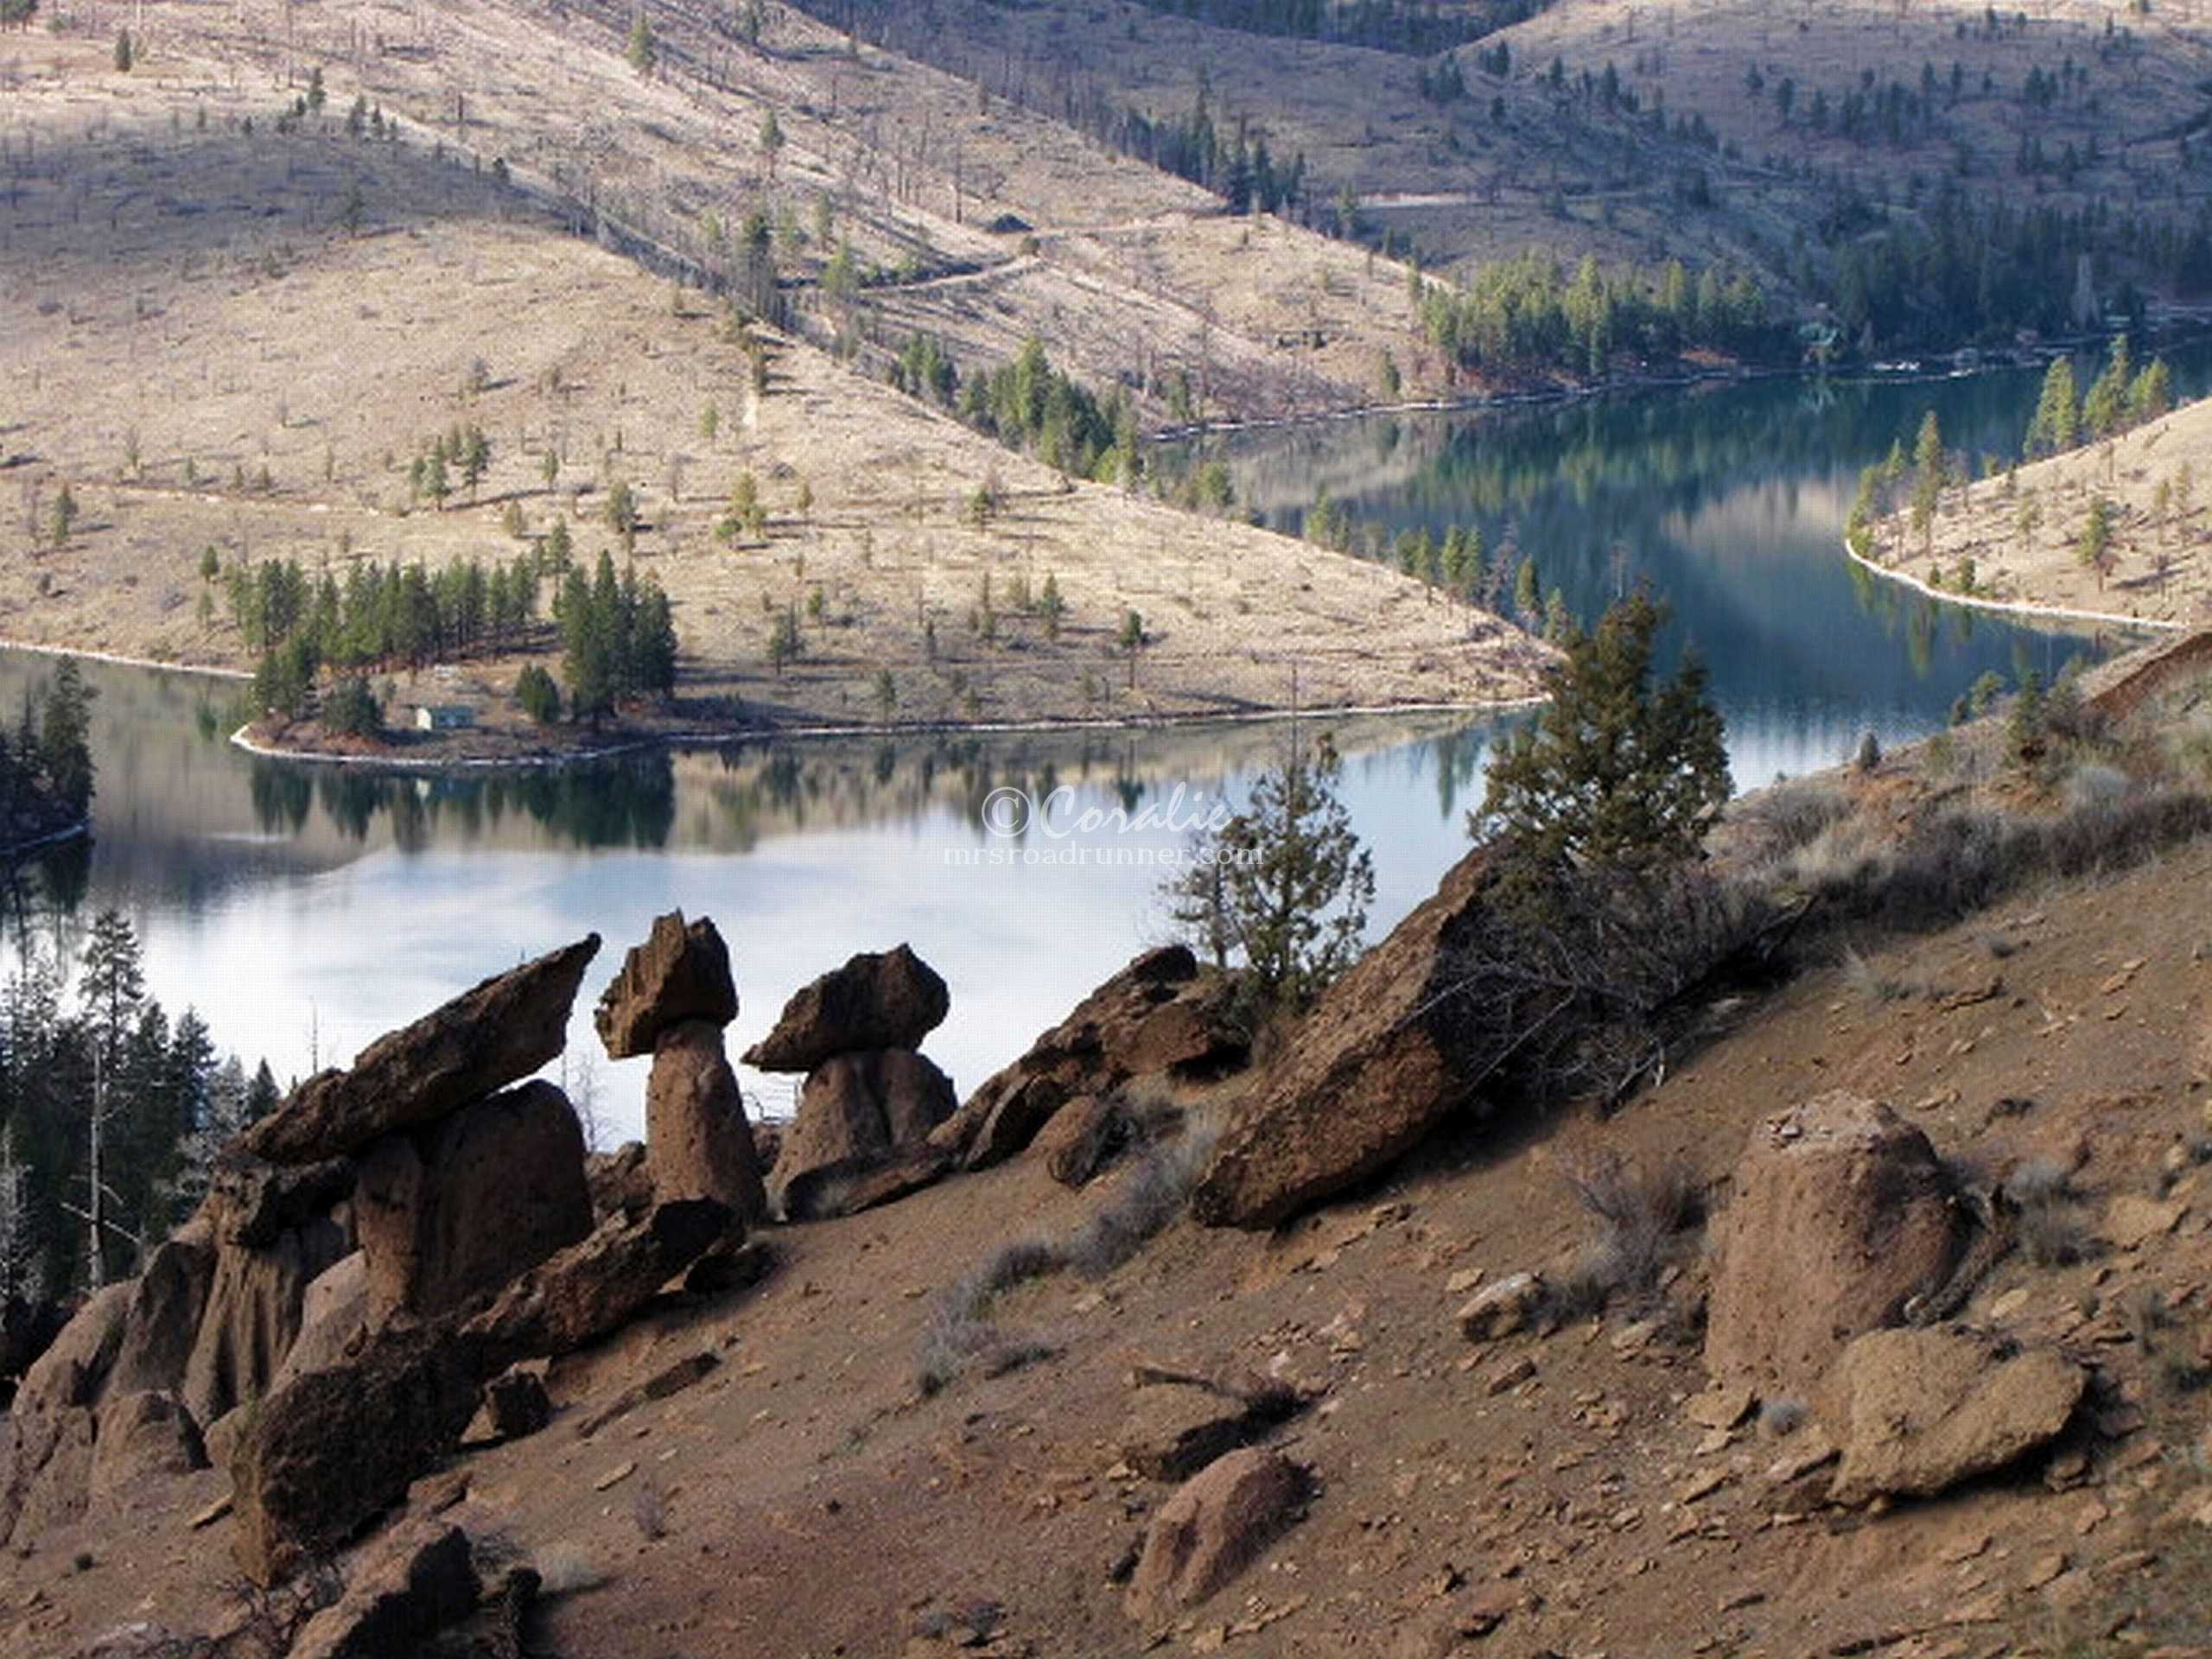 Balancing Rocks of Oregon